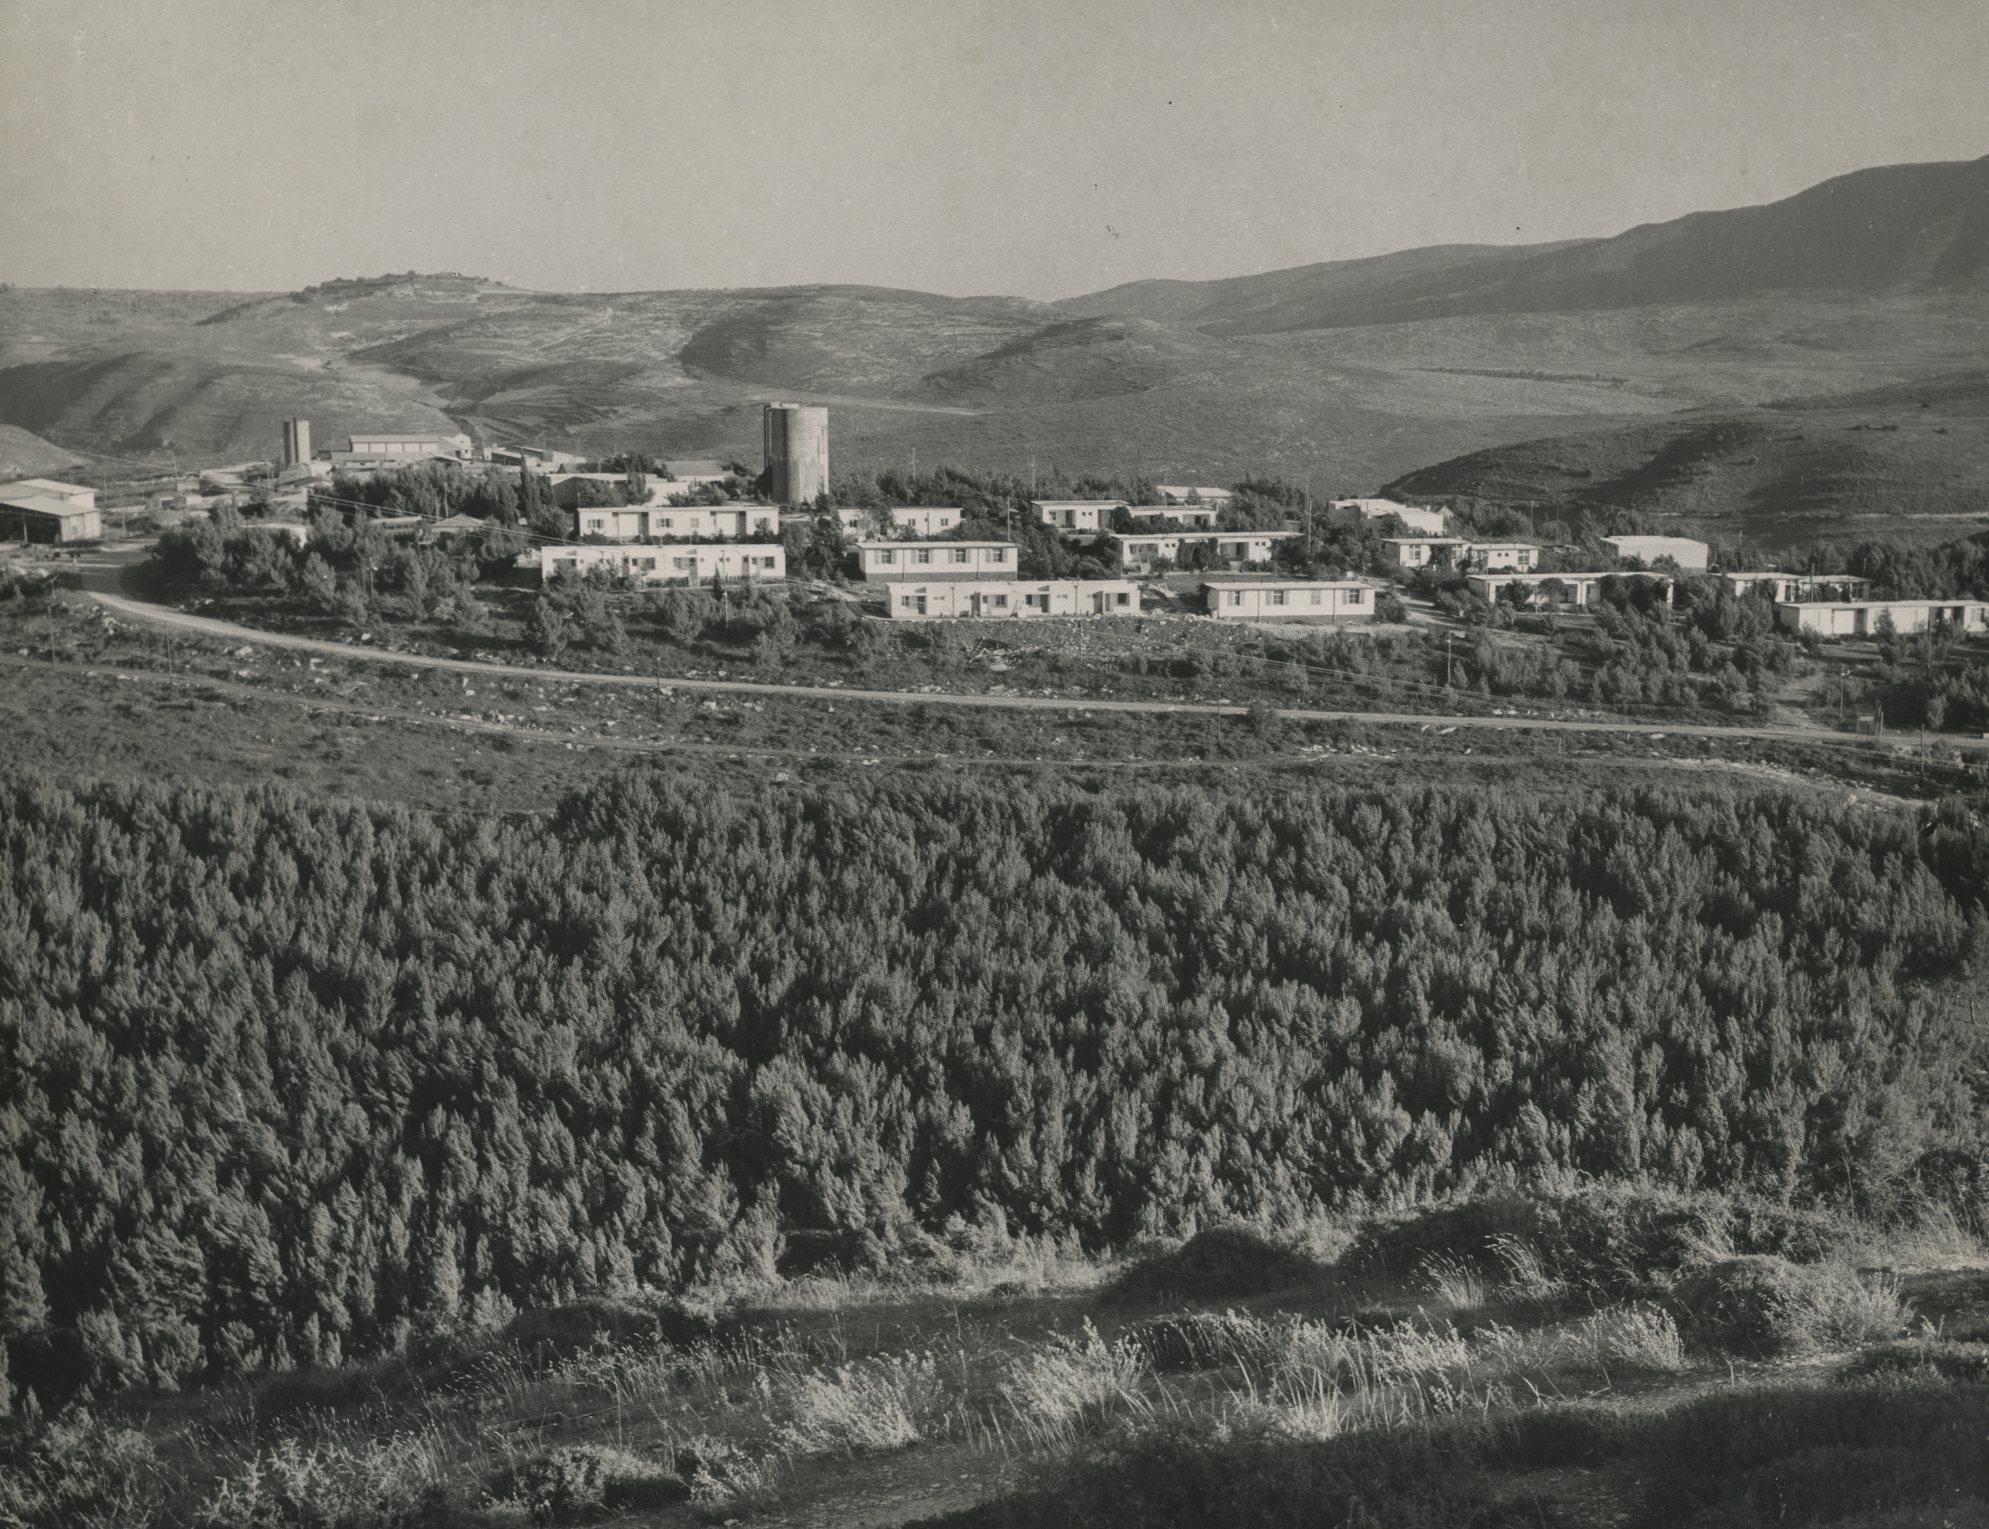 General view of a Kibbutz